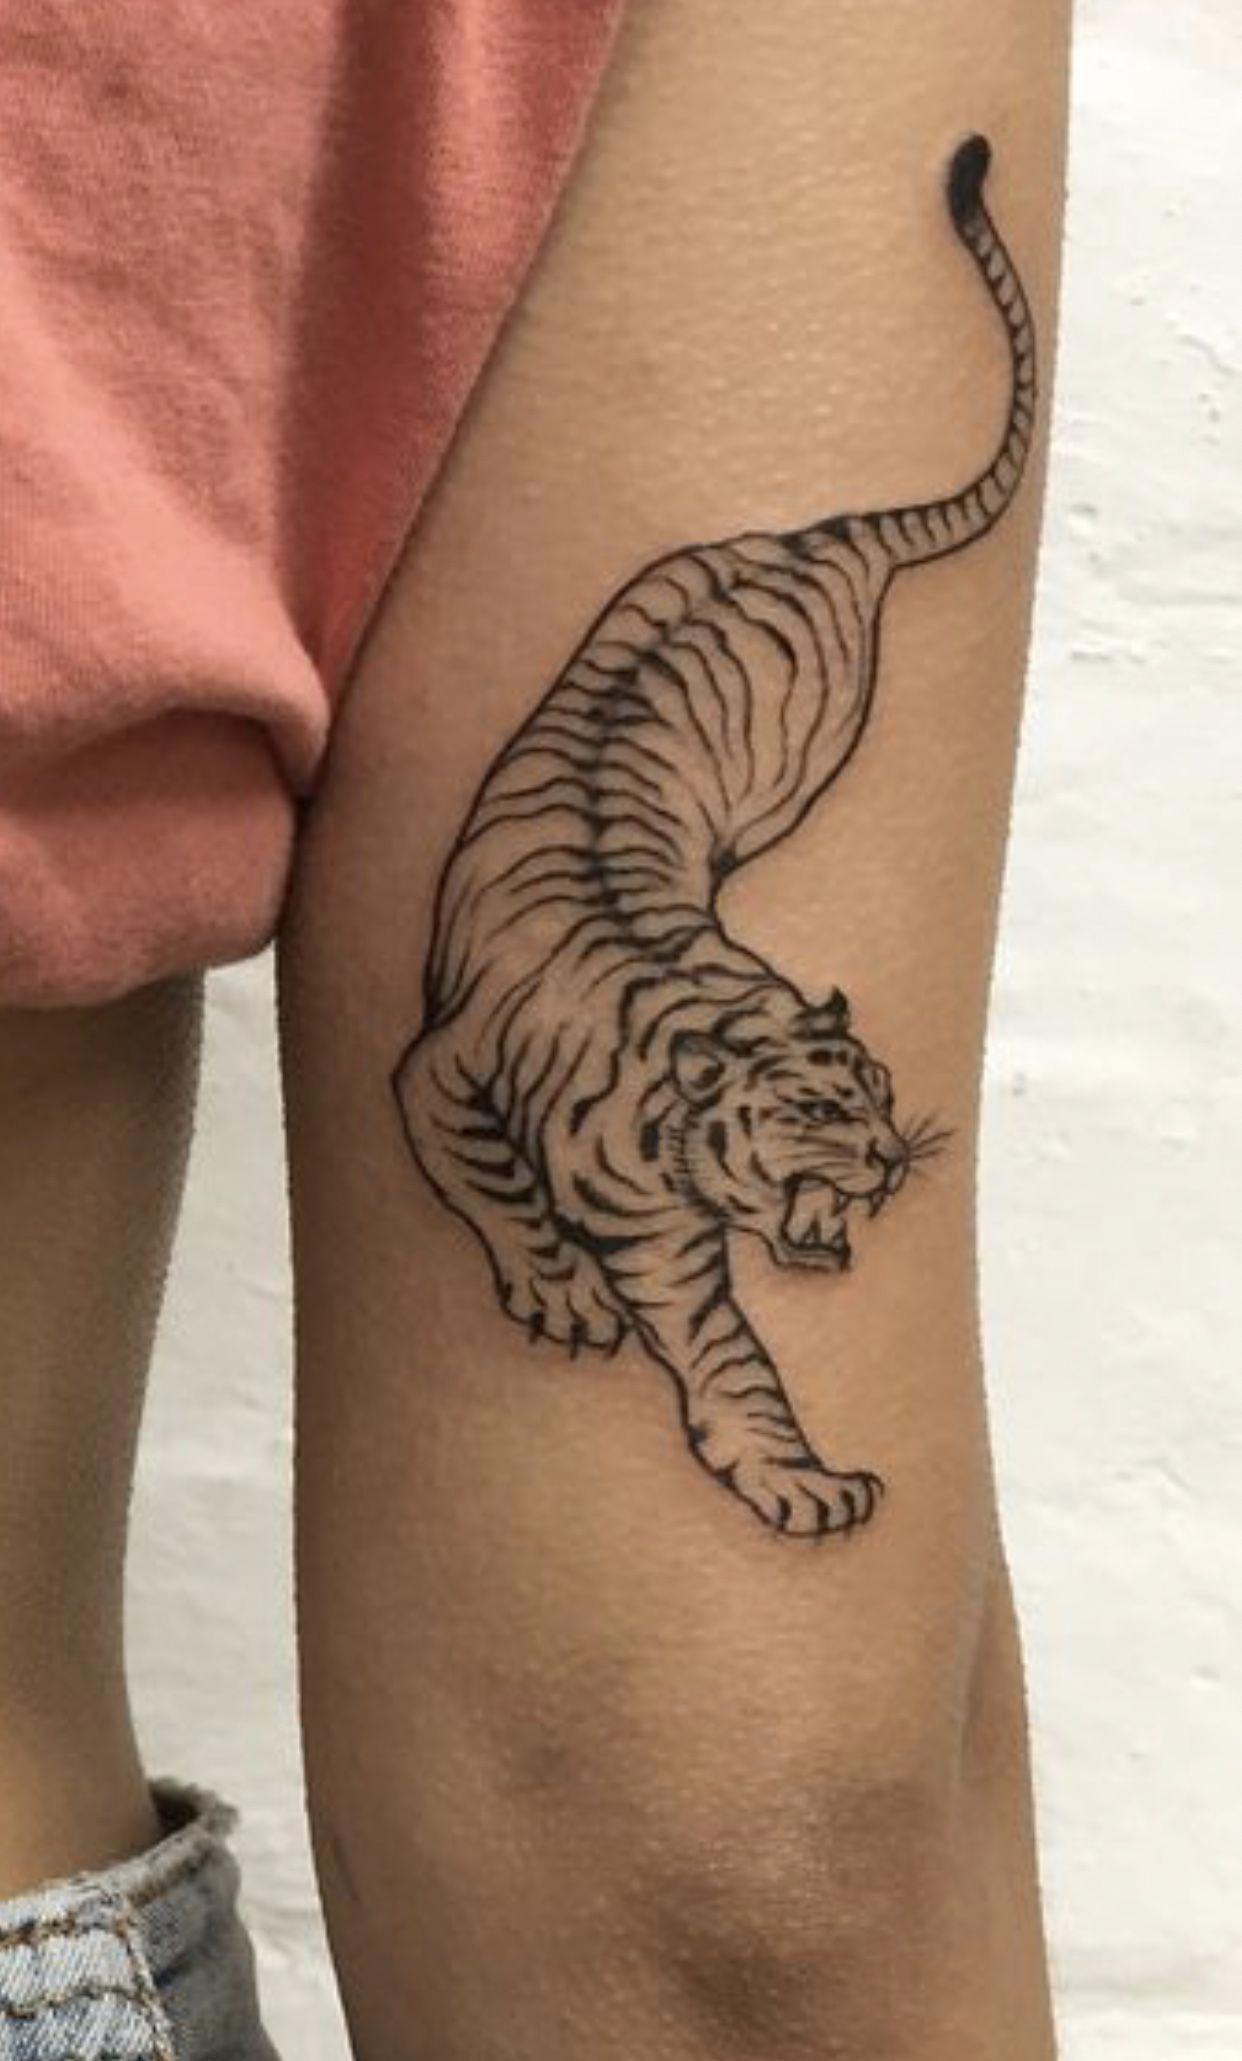 ˏˋ Stffklts ˊˎ Smalldragontattoos Tatuajes Retro Tatuajes Femeninos Tatuajes Intimos